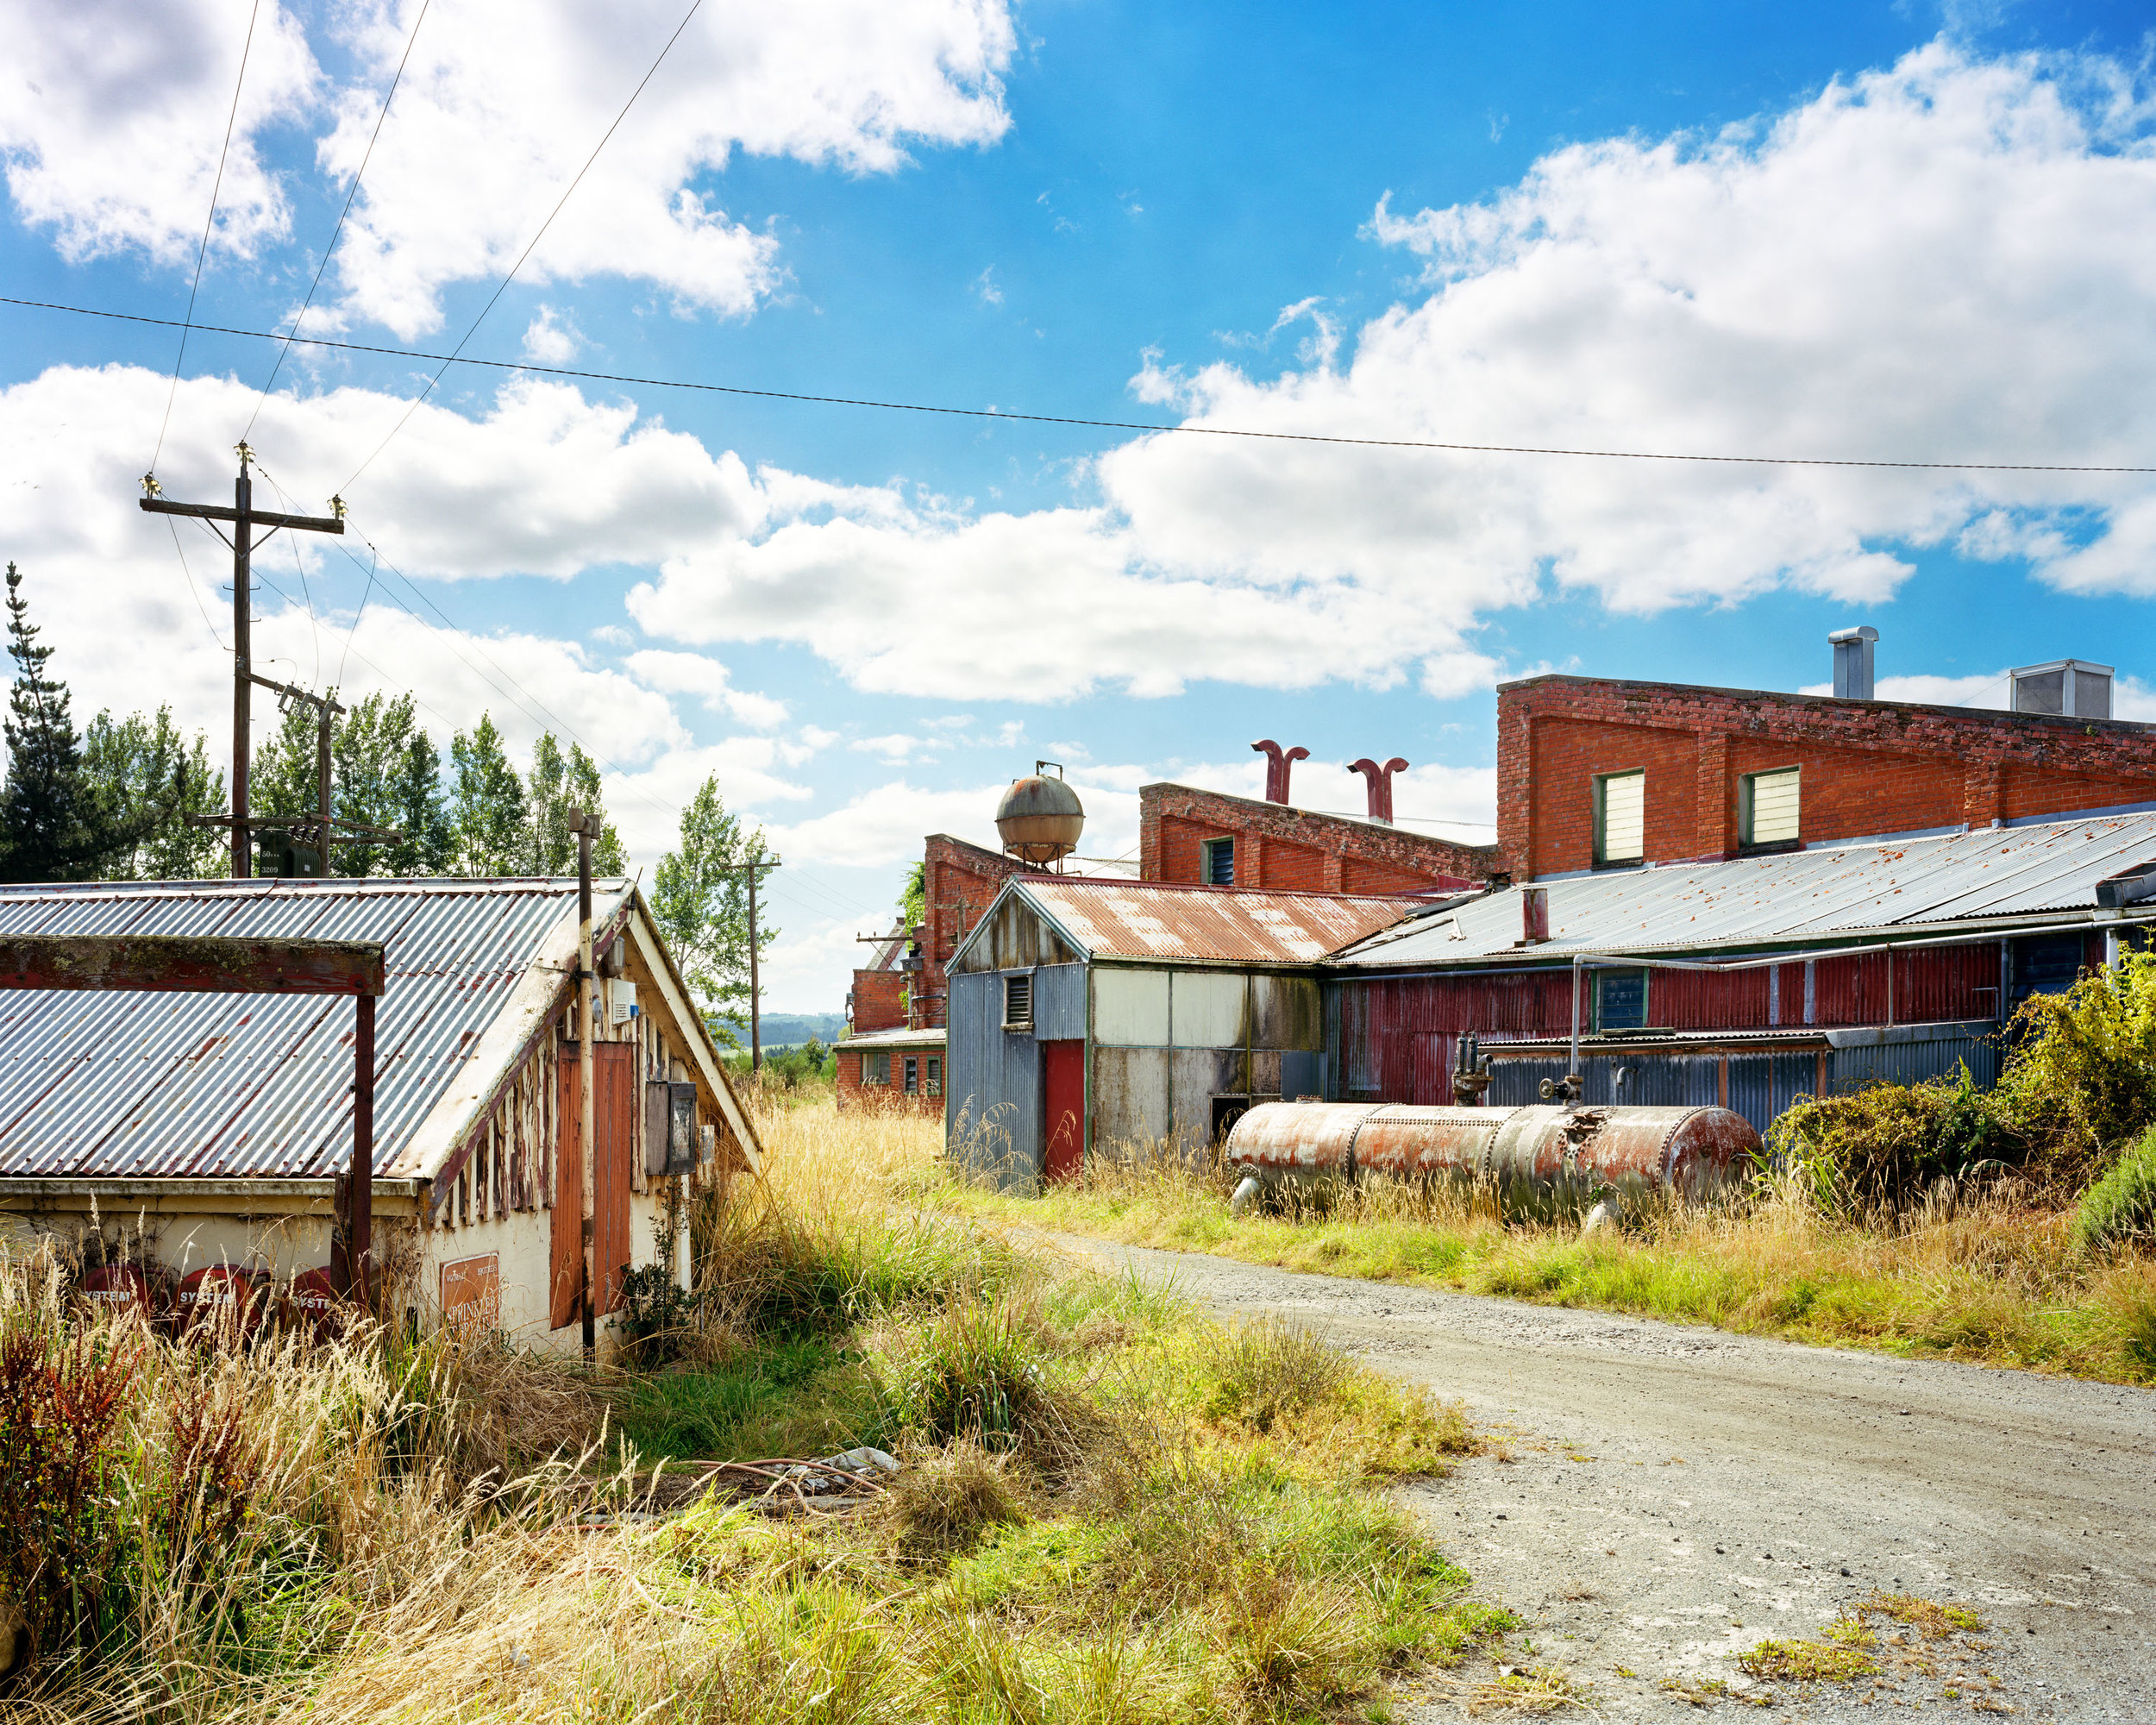 Boilers Behind the Woollen Mill, Milton